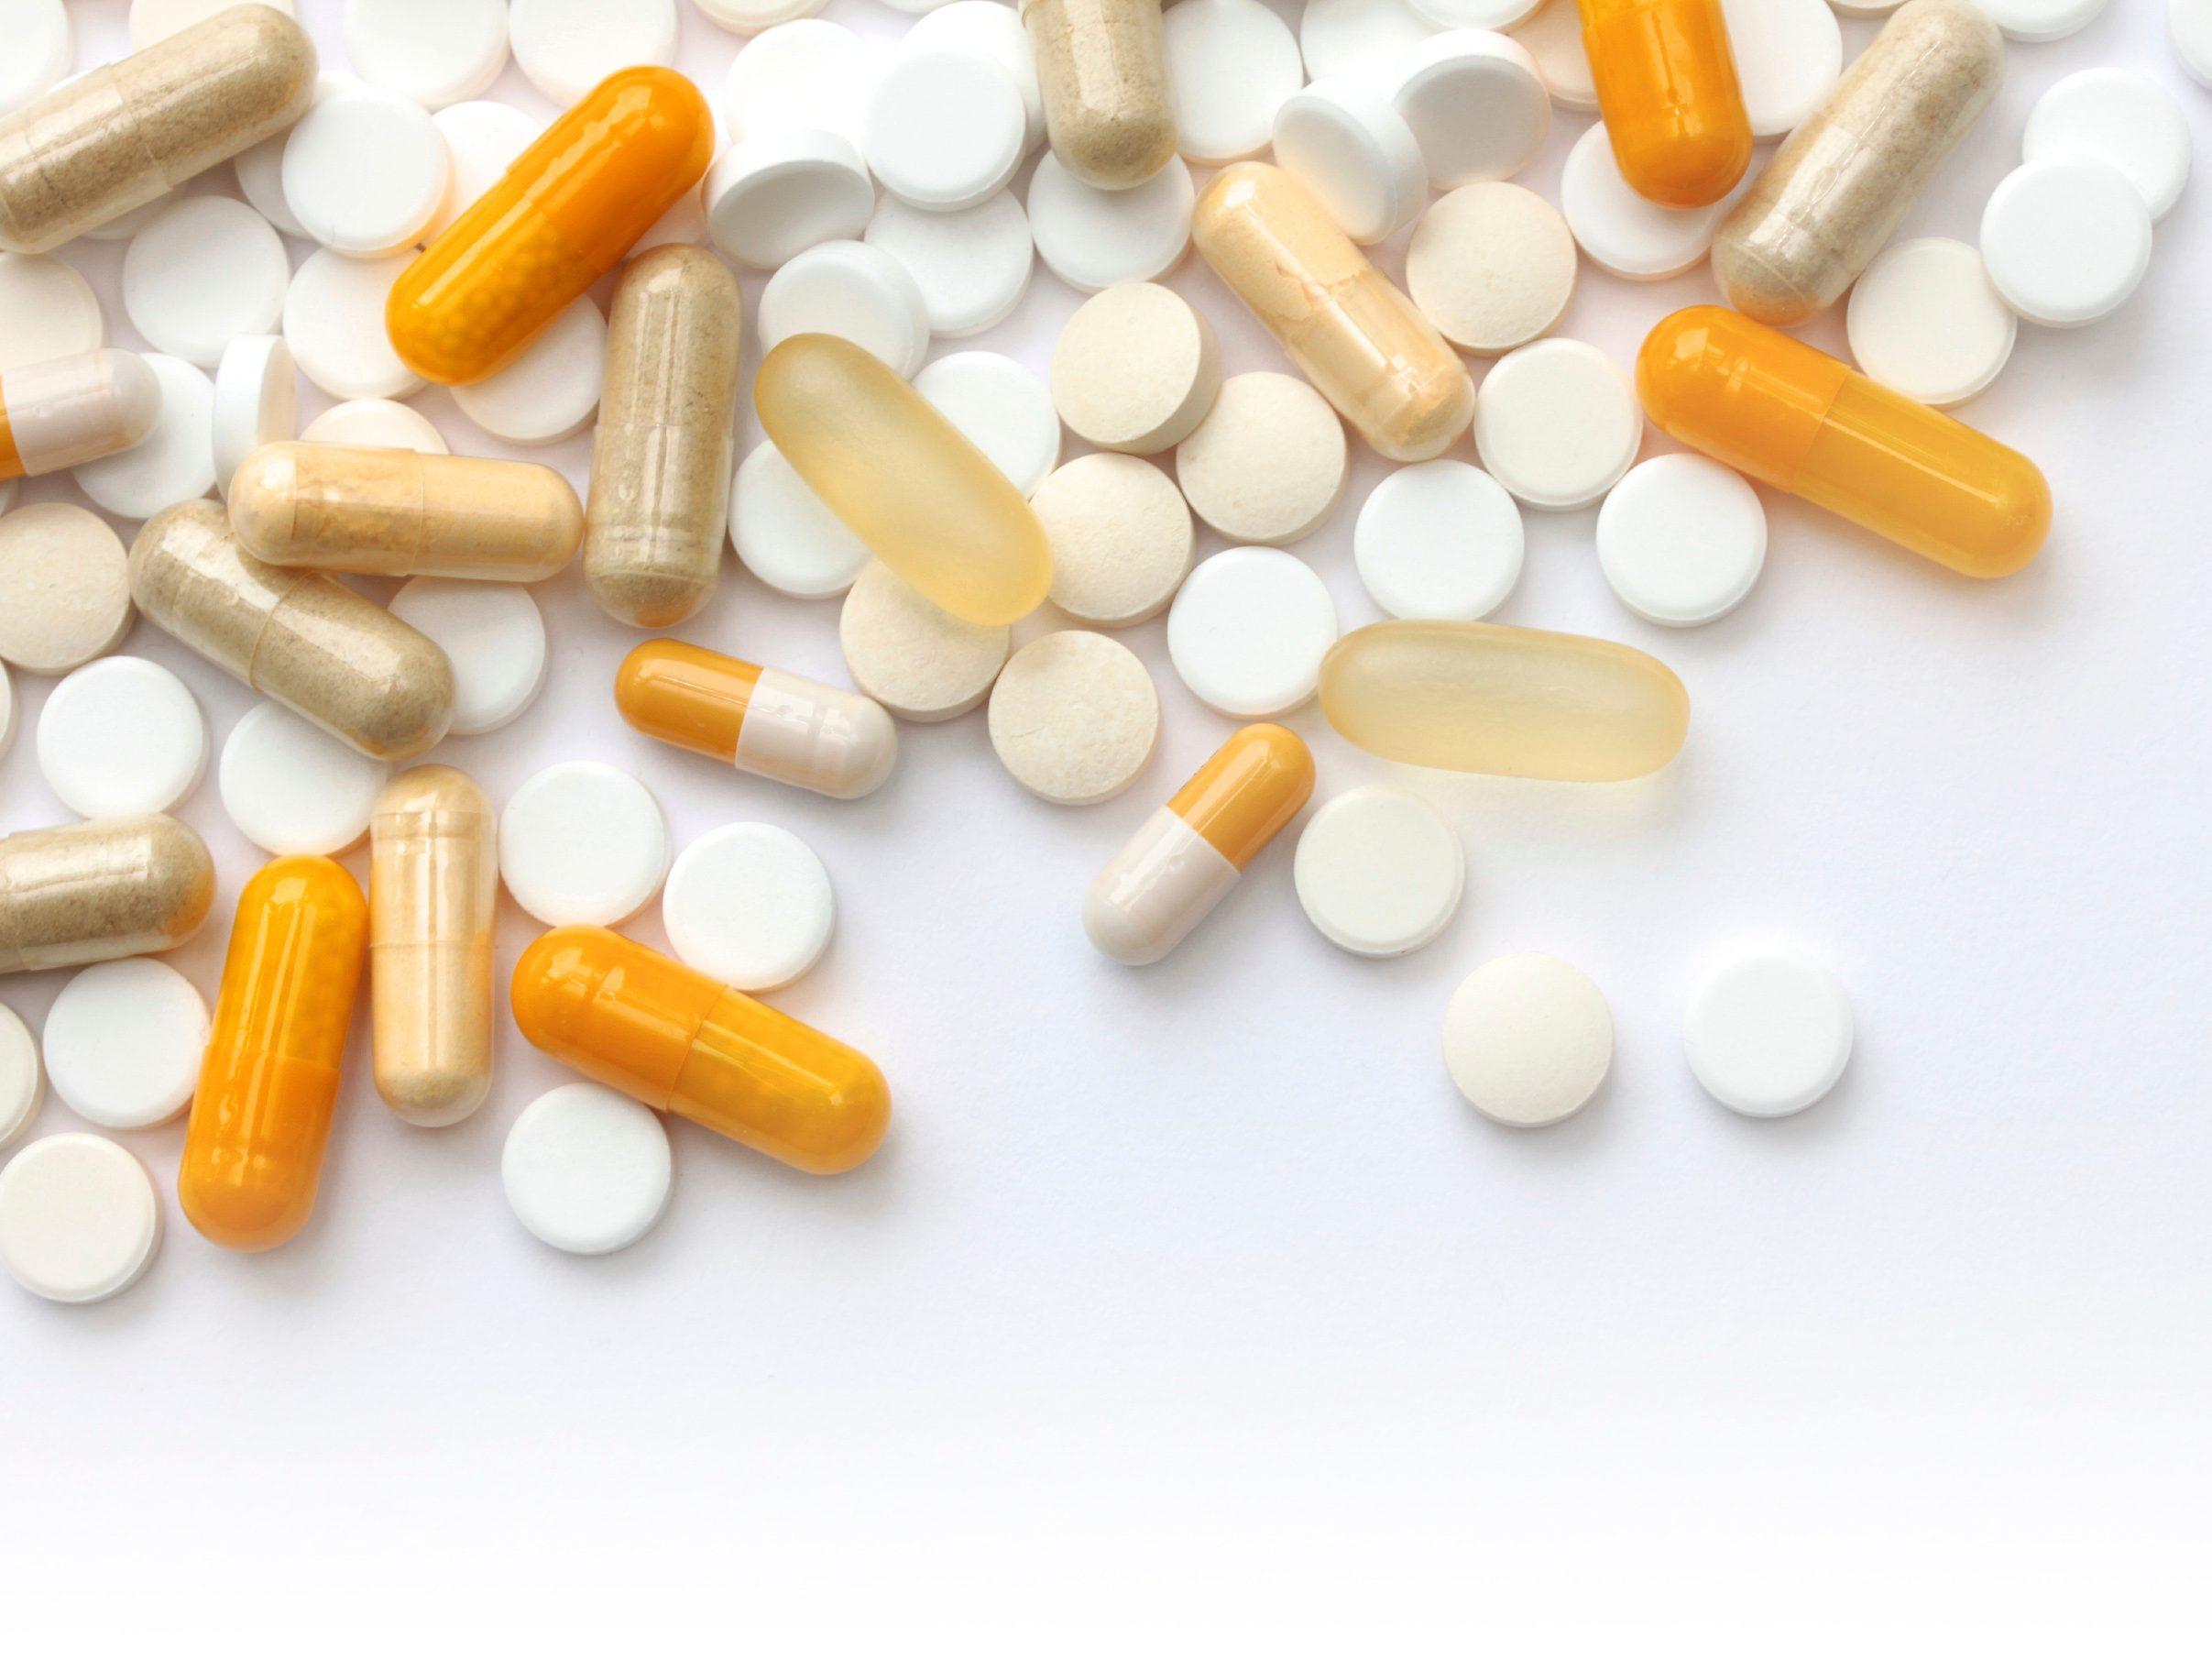 2. Re-think cold medicine